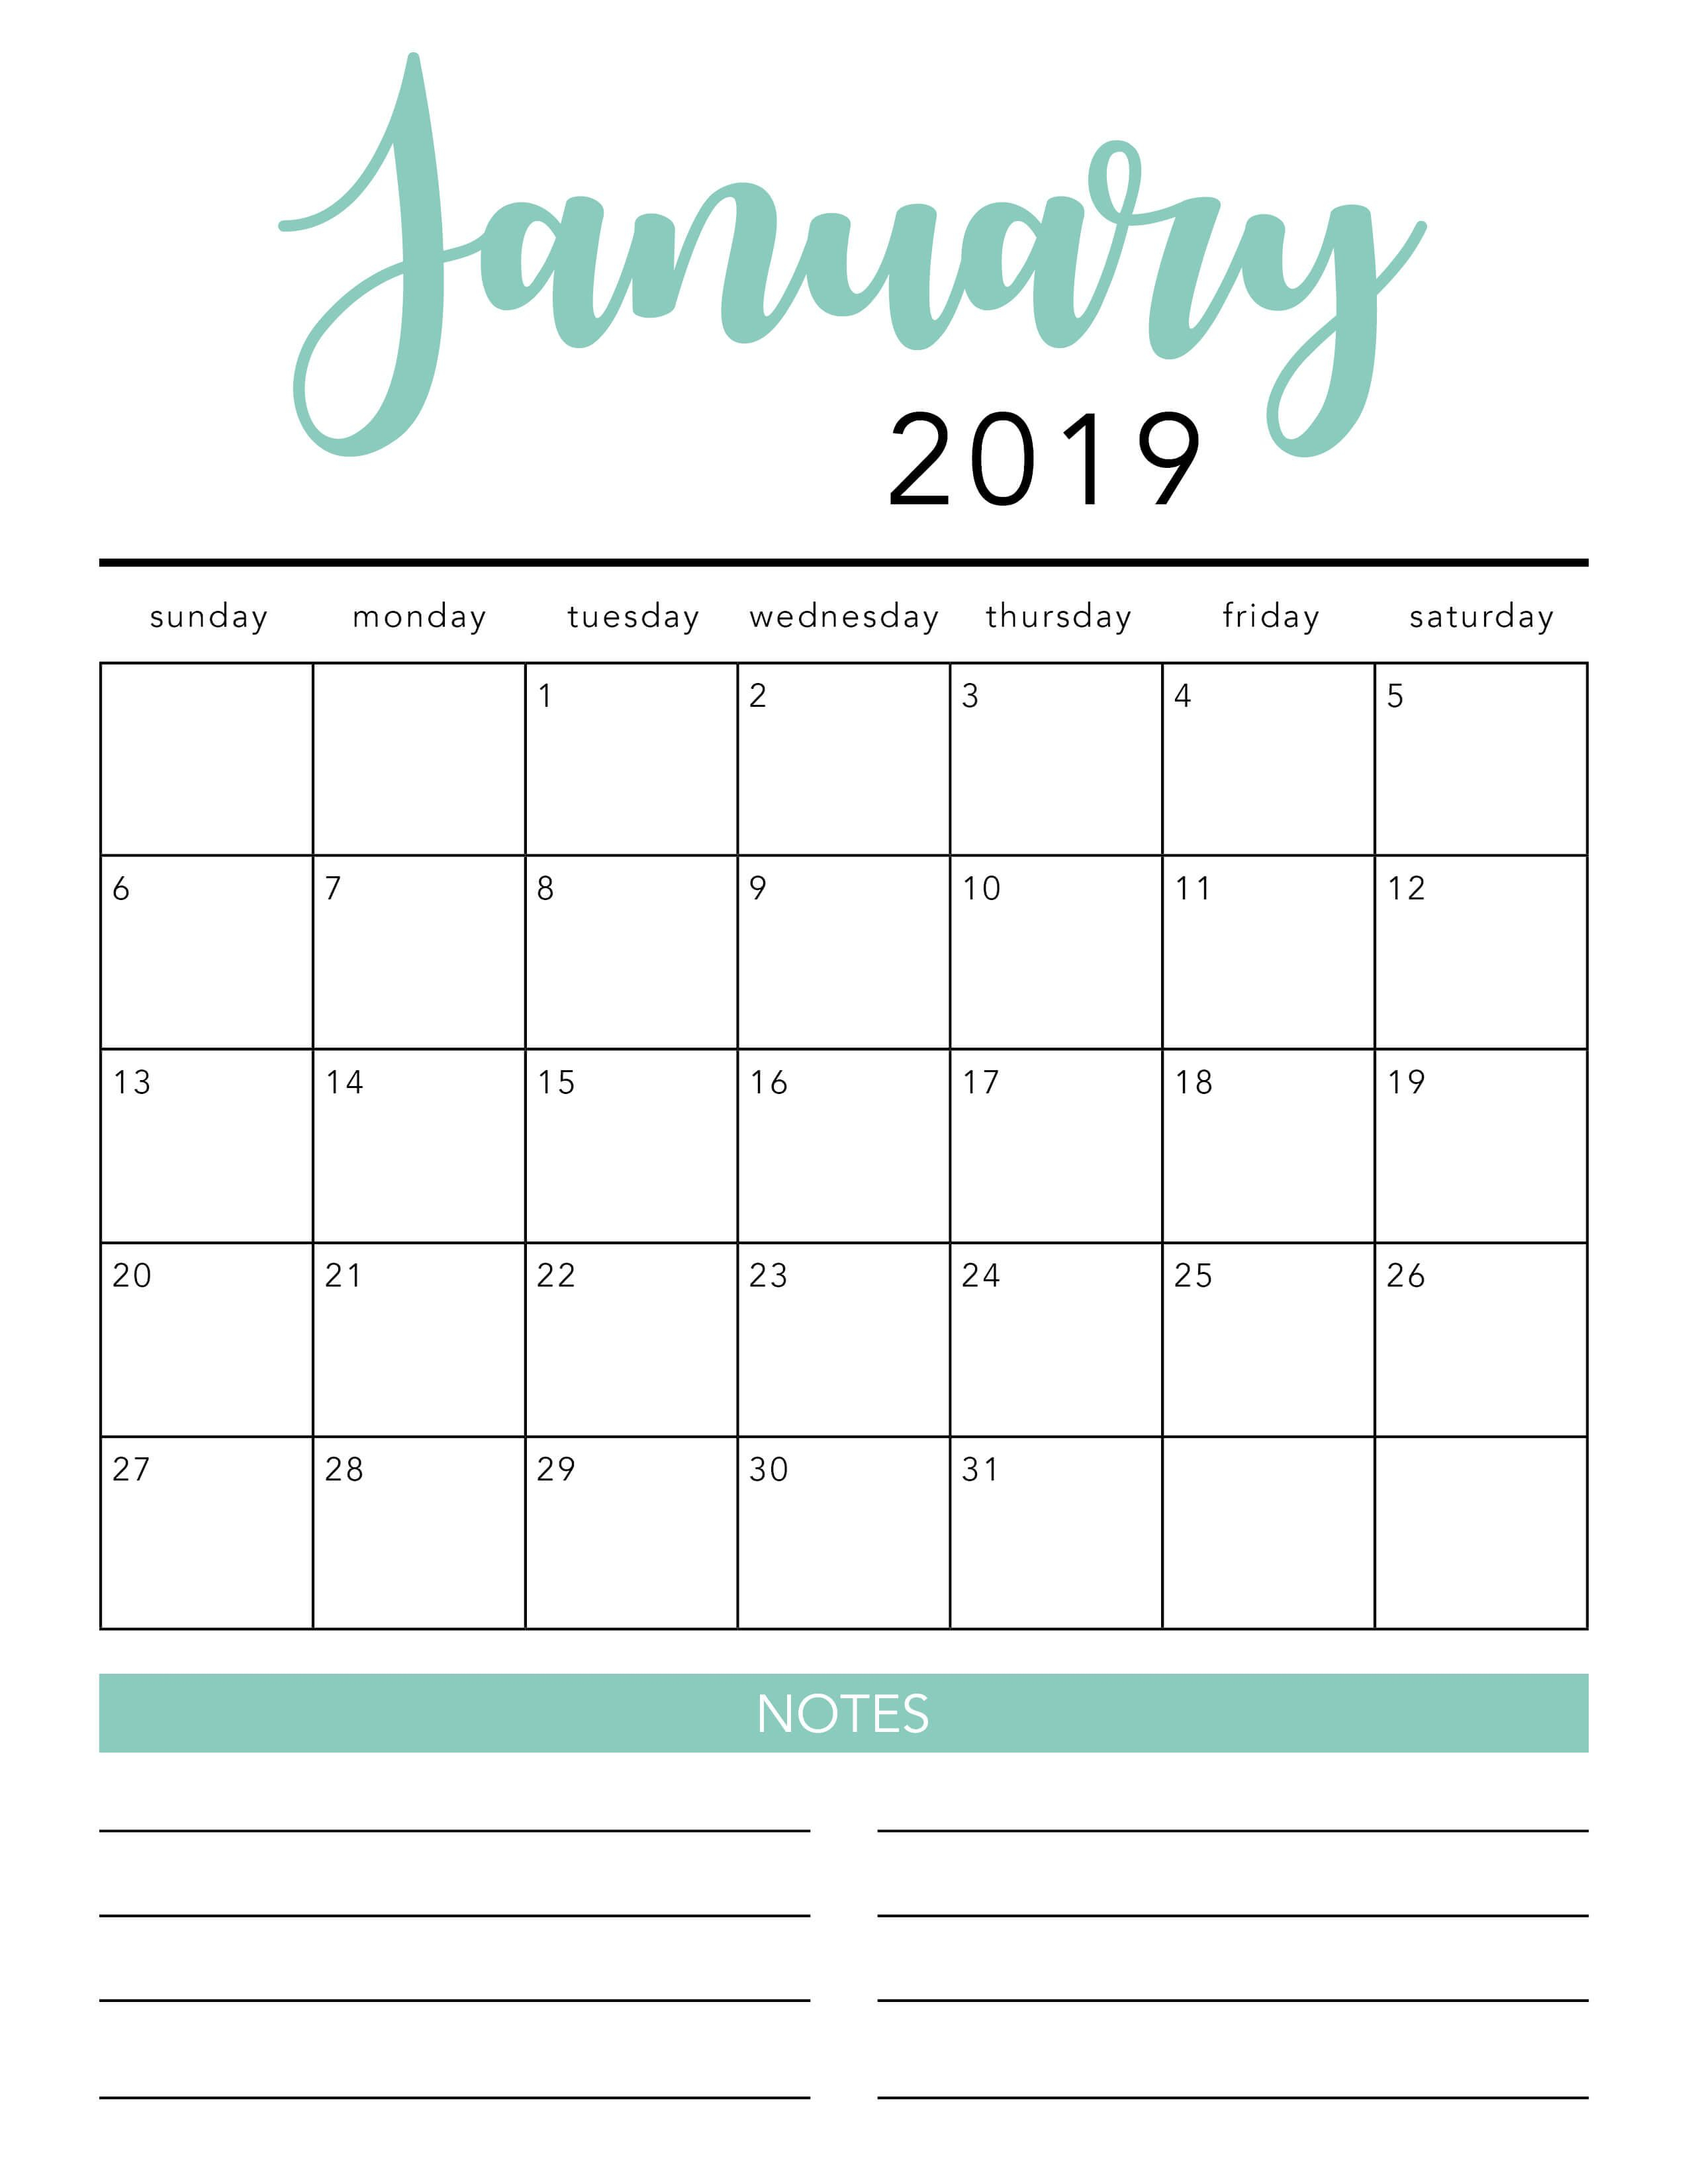 Free 2019 Printable Calendar Template (2 Colors!) - I Heart Naptime in Free Printable Calendar Templates Month